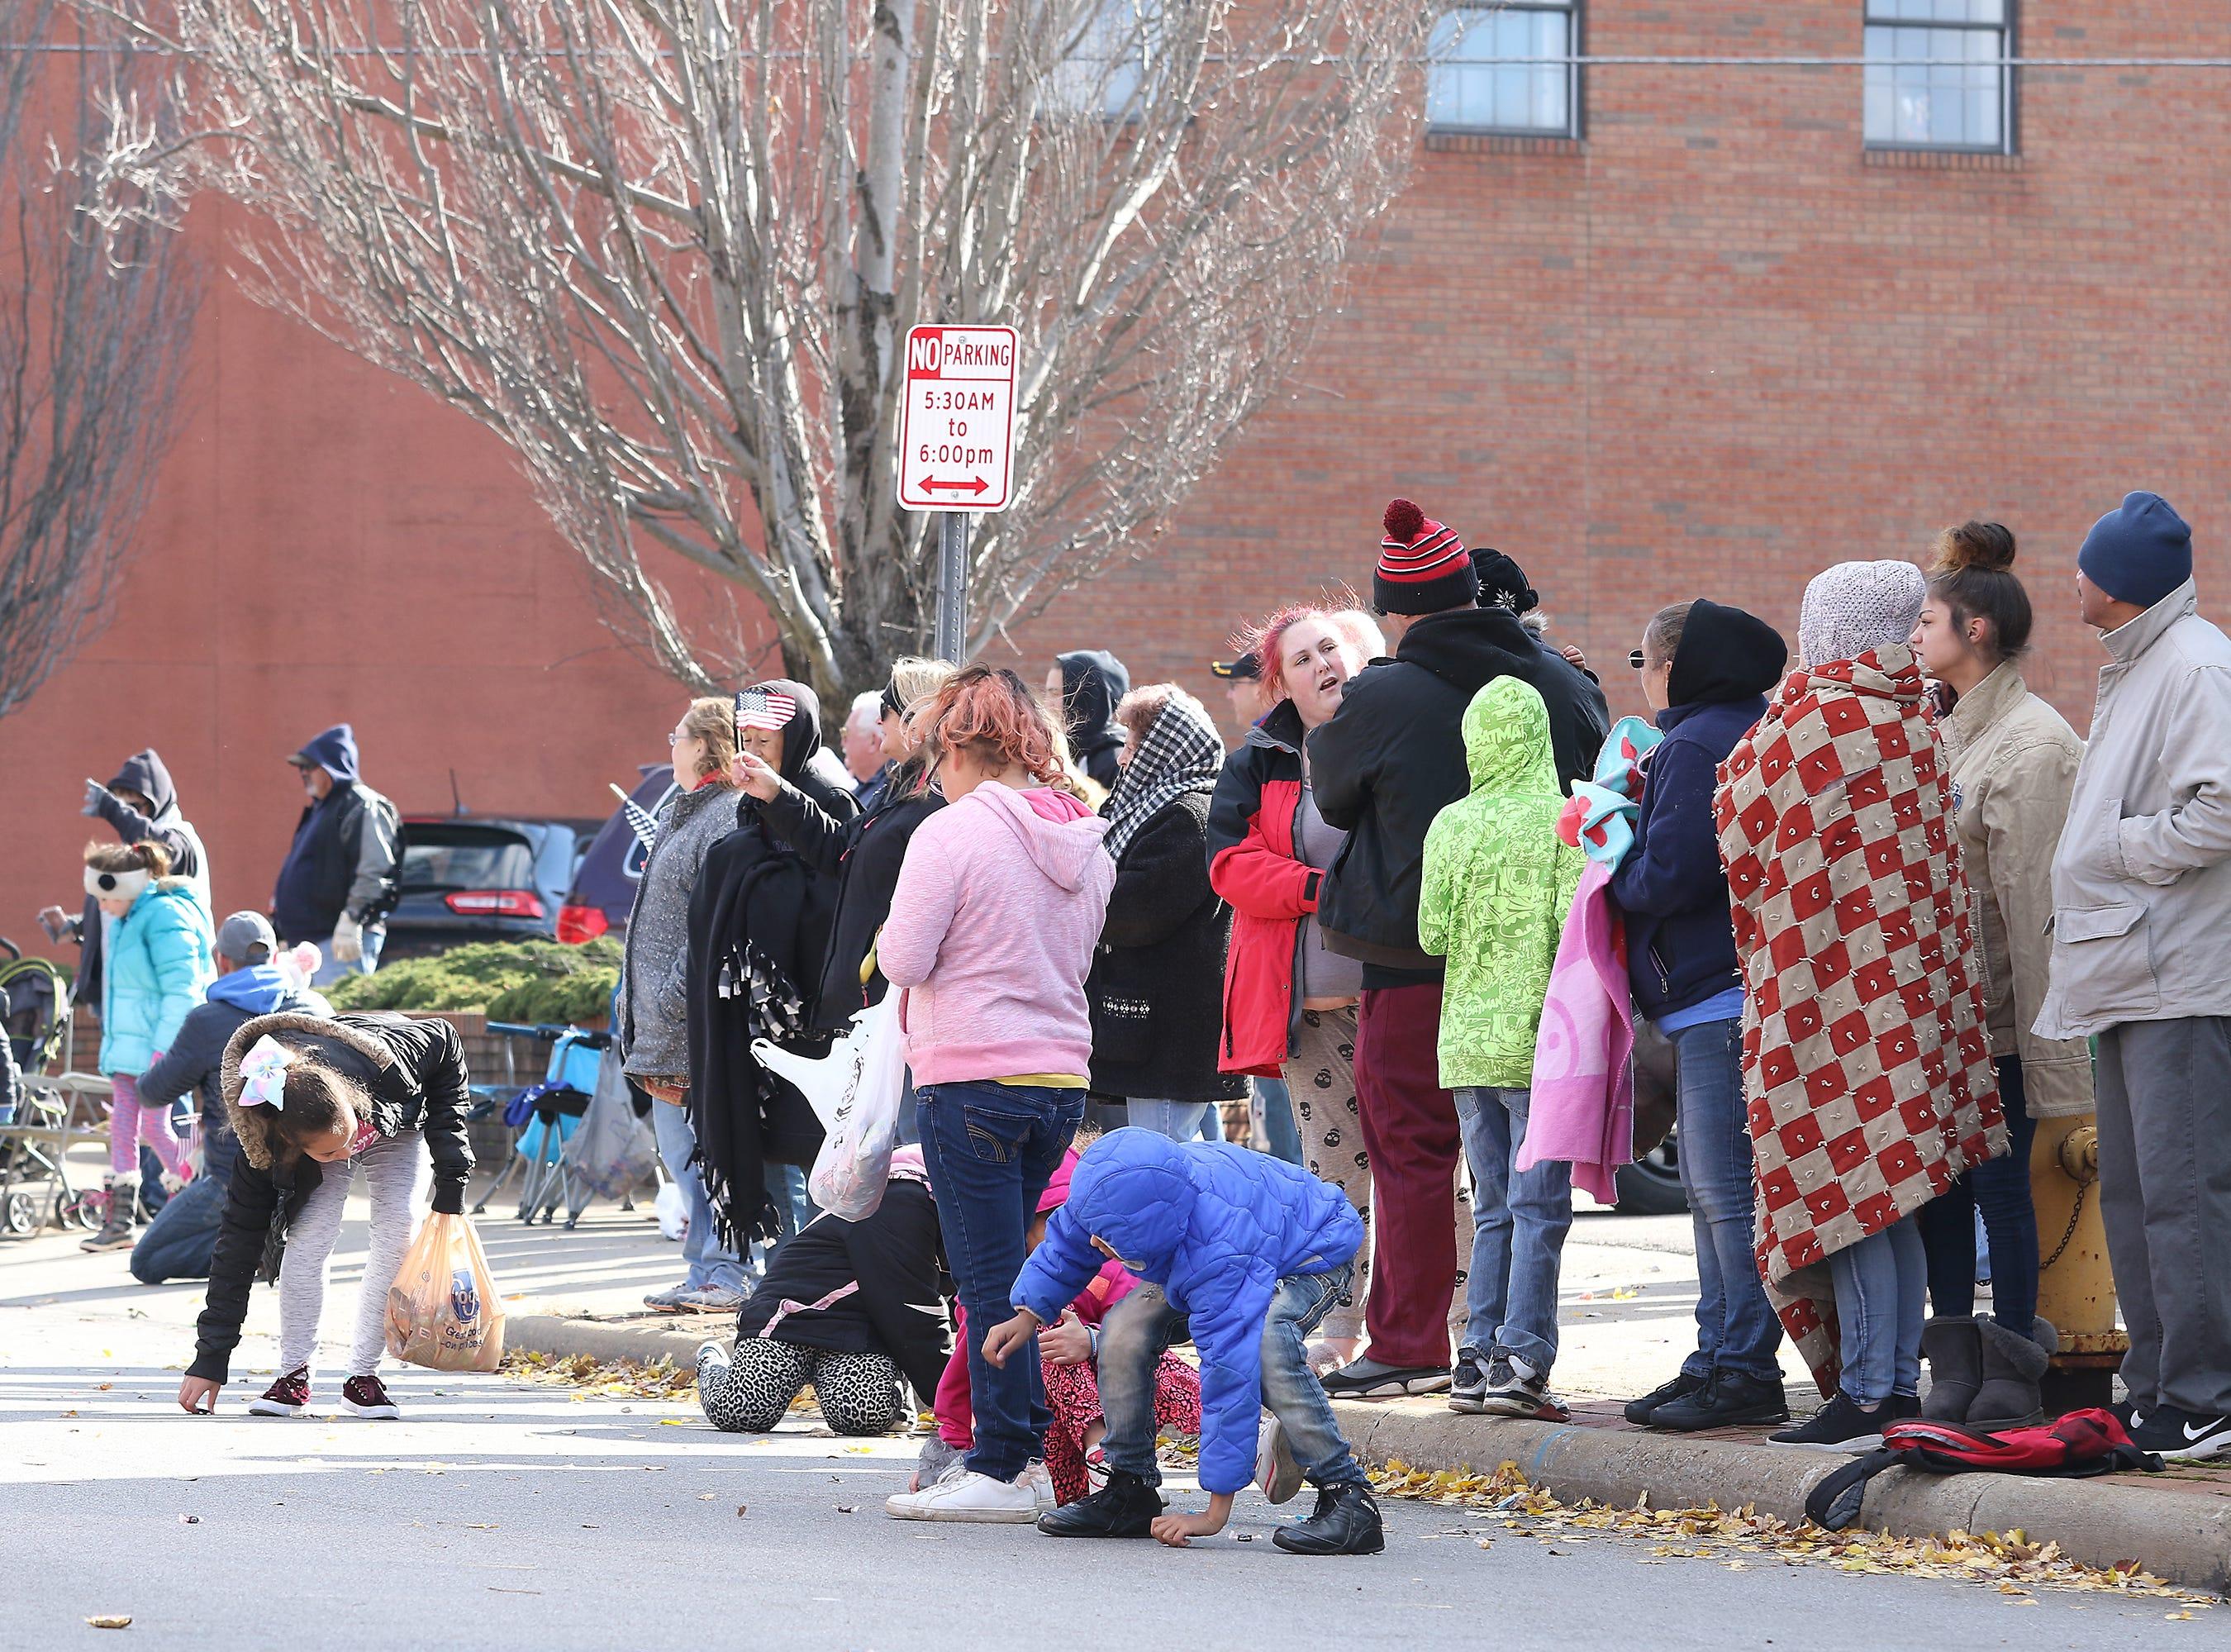 The Zanesville Veterans Day Parade wound its way through downtown Zanesville on Saturday.